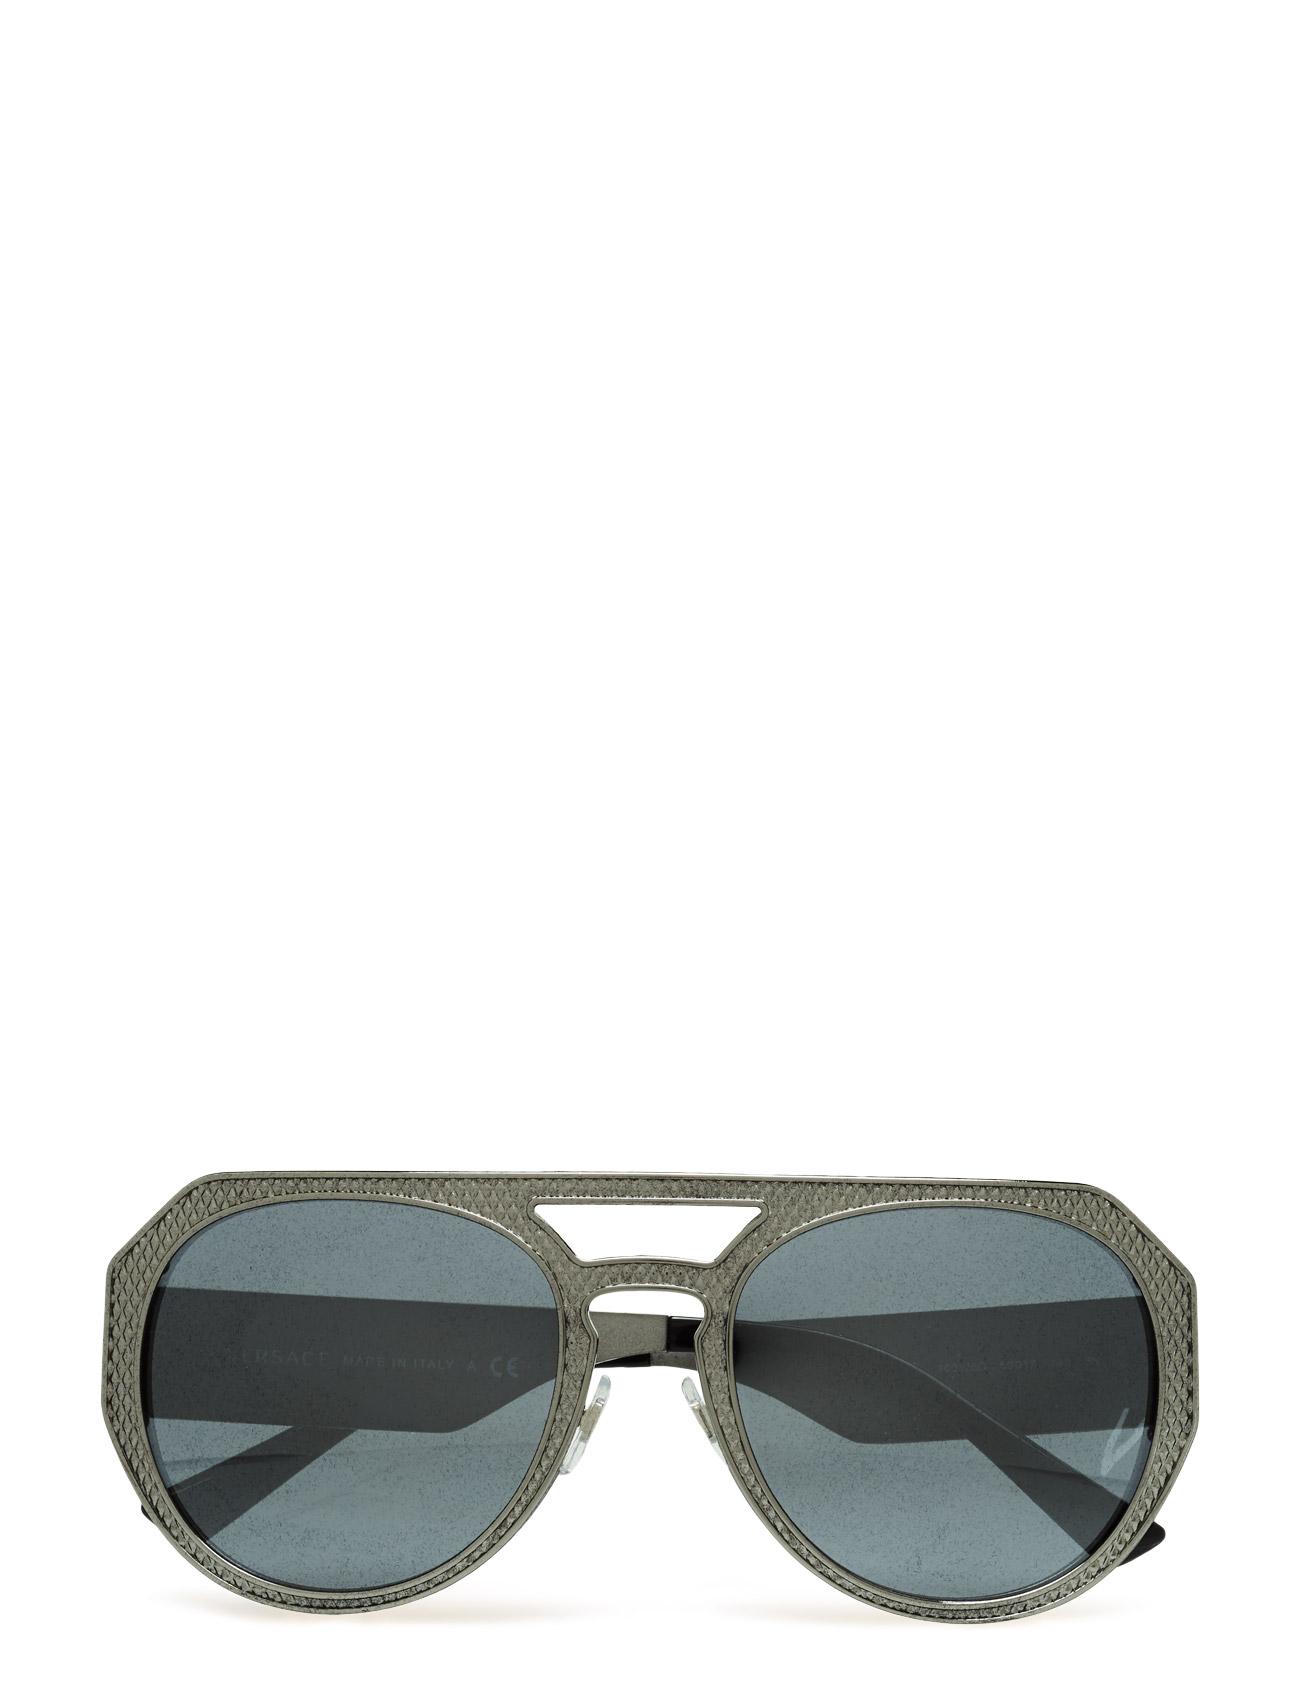 versace sunglasses Rock icons | studs medusa fra boozt.com dk